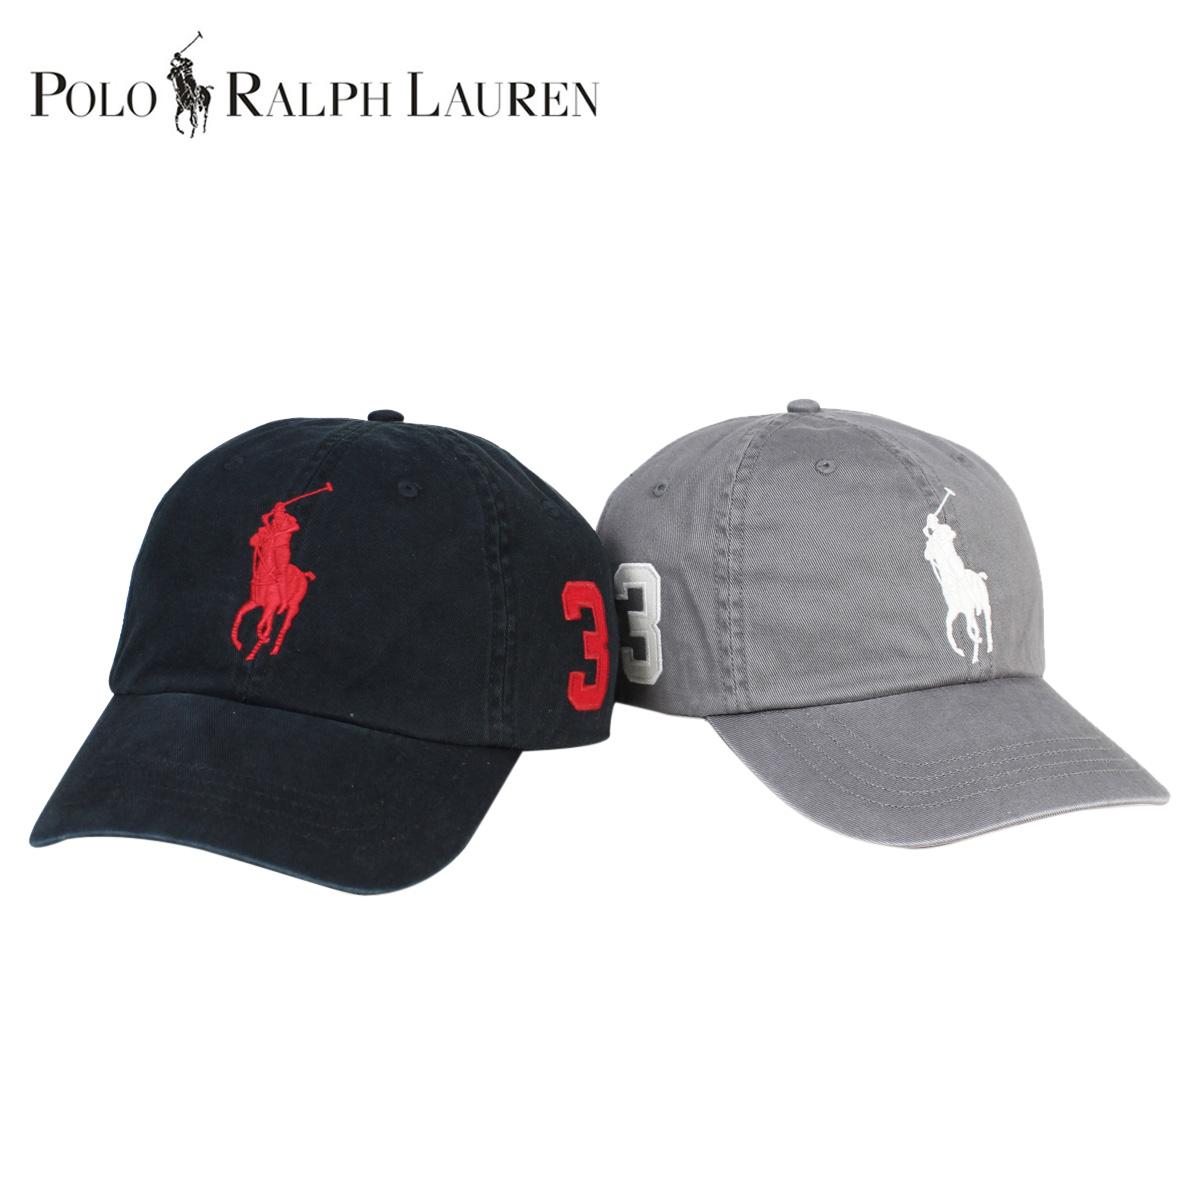 Sugar Online Shop  POLO RALPH LAUREN cap hat men gap Dis snapback cap Ralph  Lauren polo black gray  11 1 Shinnyu load   1545b726f88f